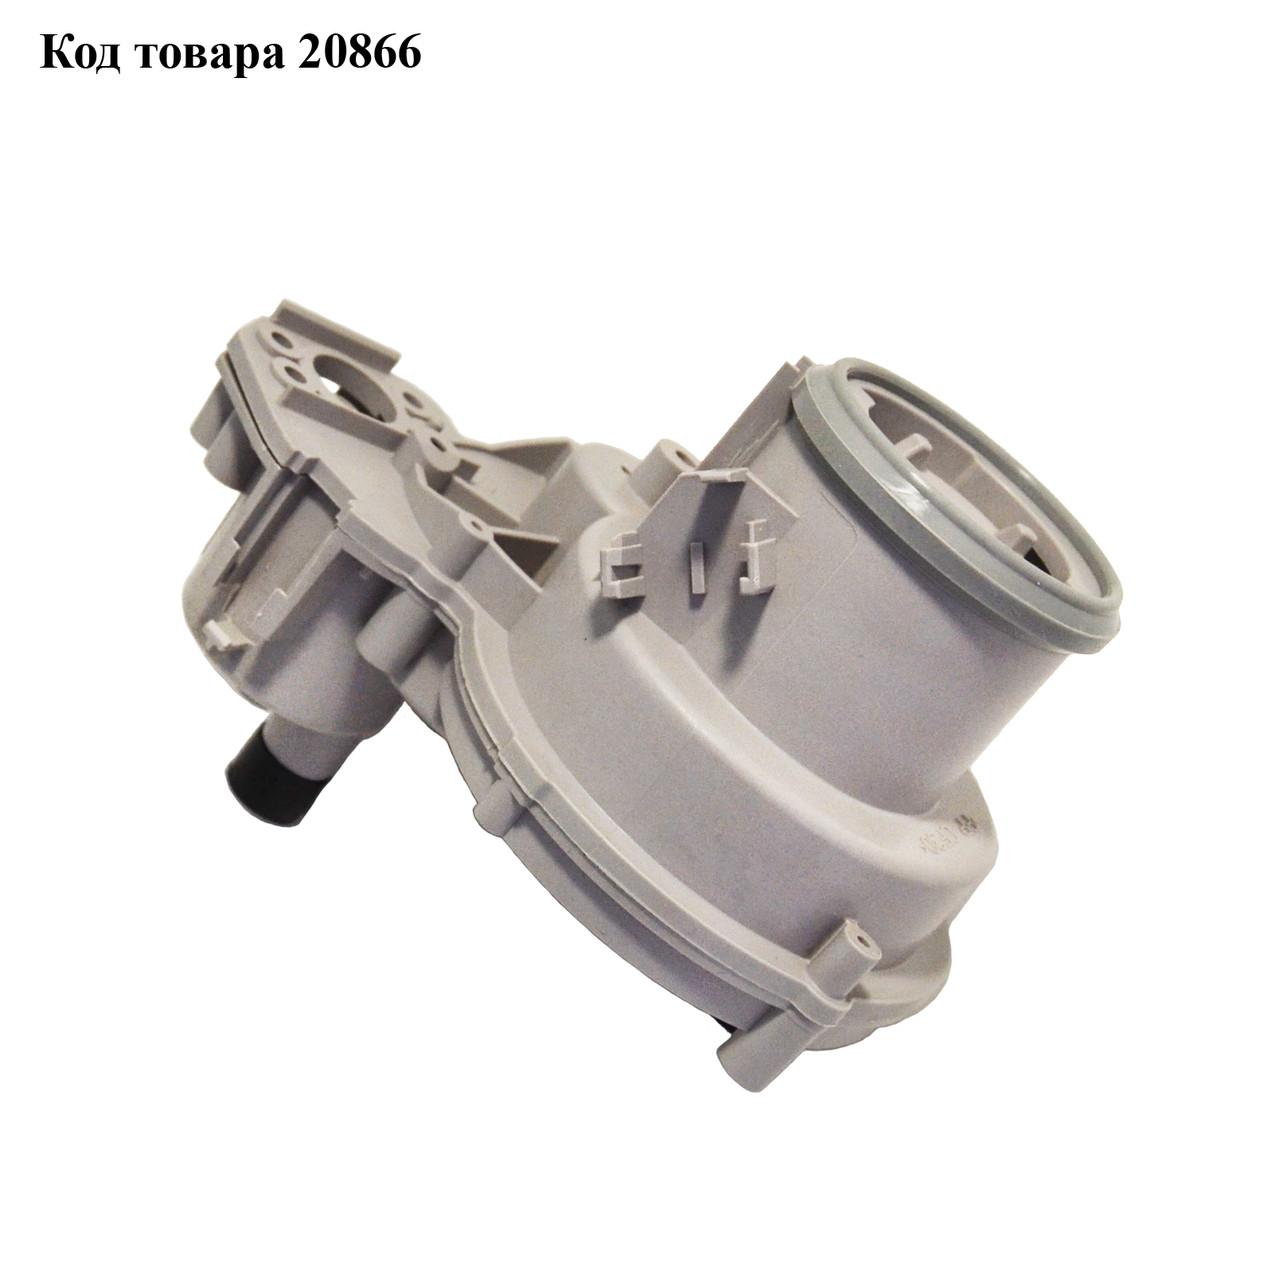 Редуктор для м'ясорубки Moulinex HV2, HV4 SS-194349 (SS-192322)